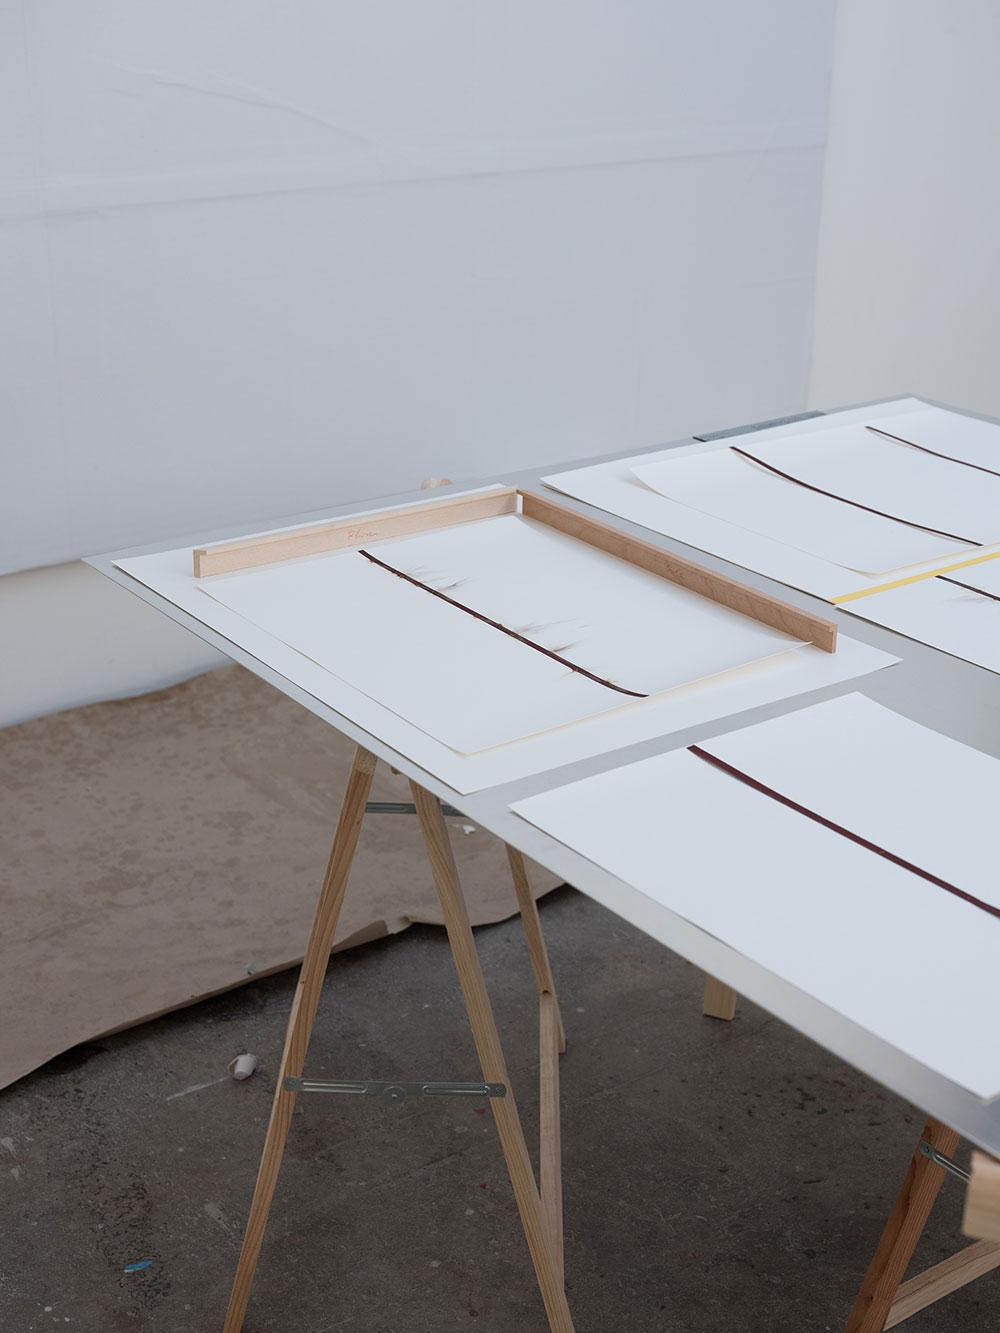 thomas-wachholz-studio.jpg